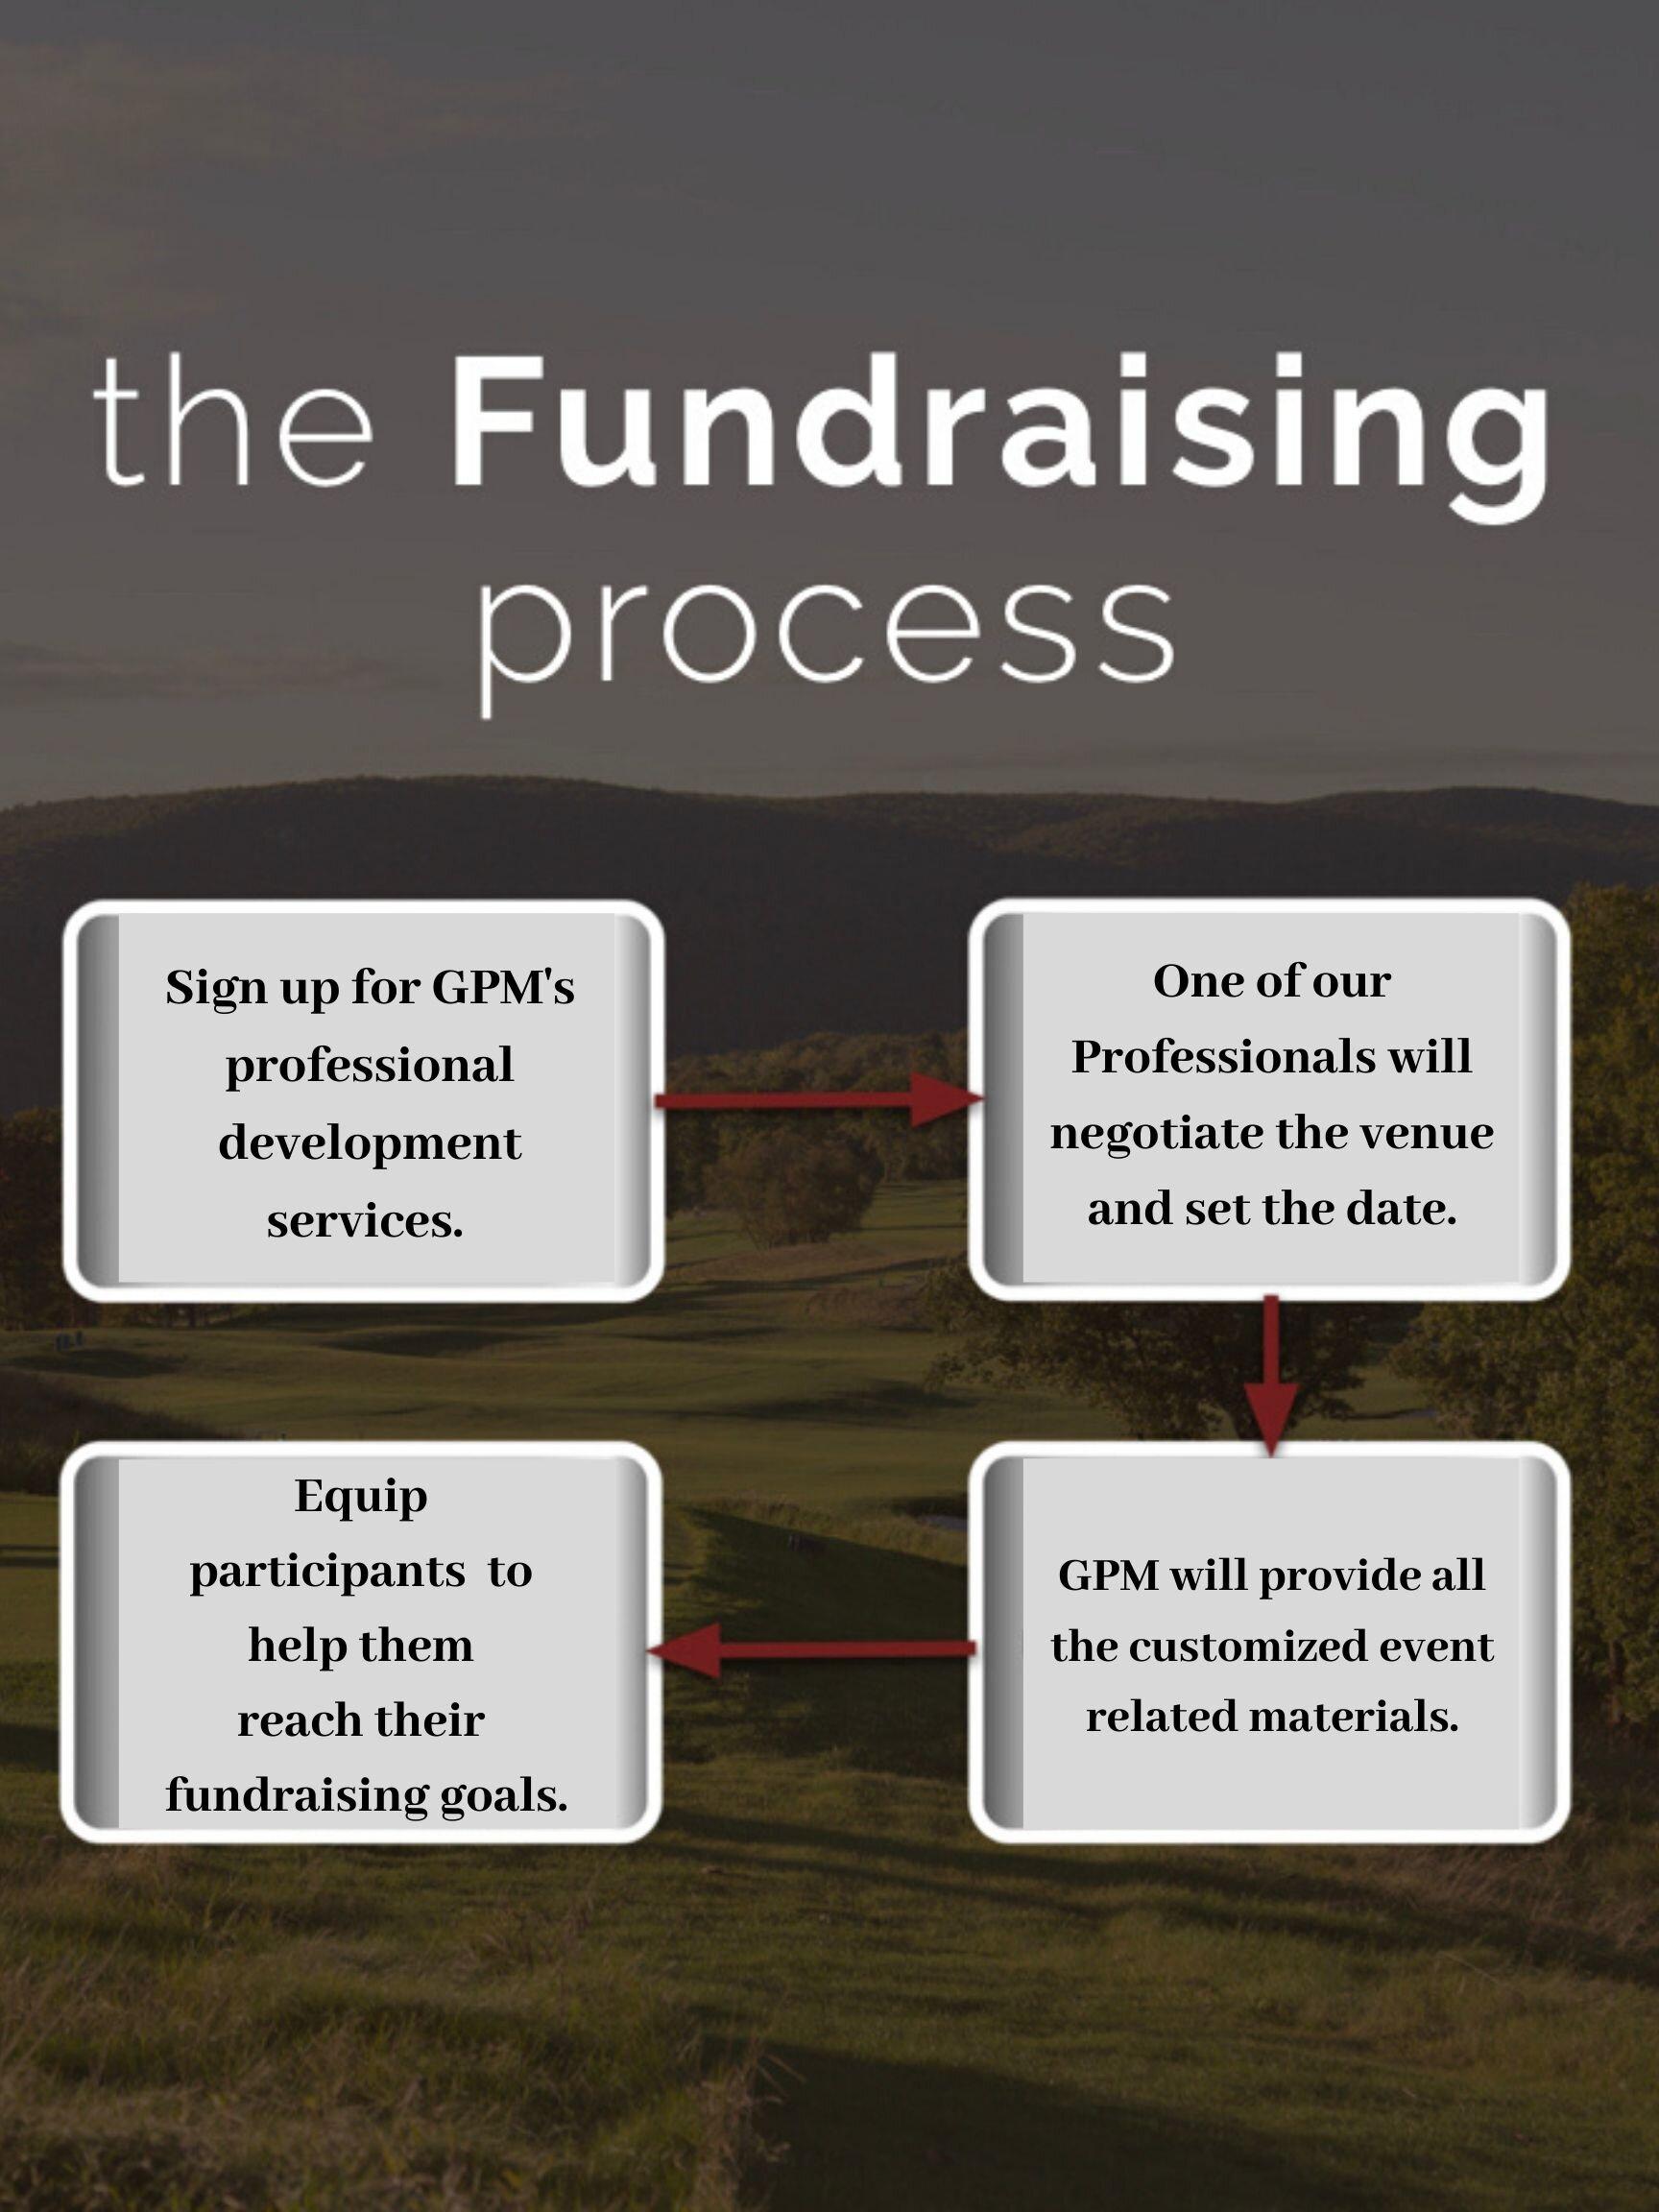 A GPM Professional will negociatethe venue and set a date..jpg